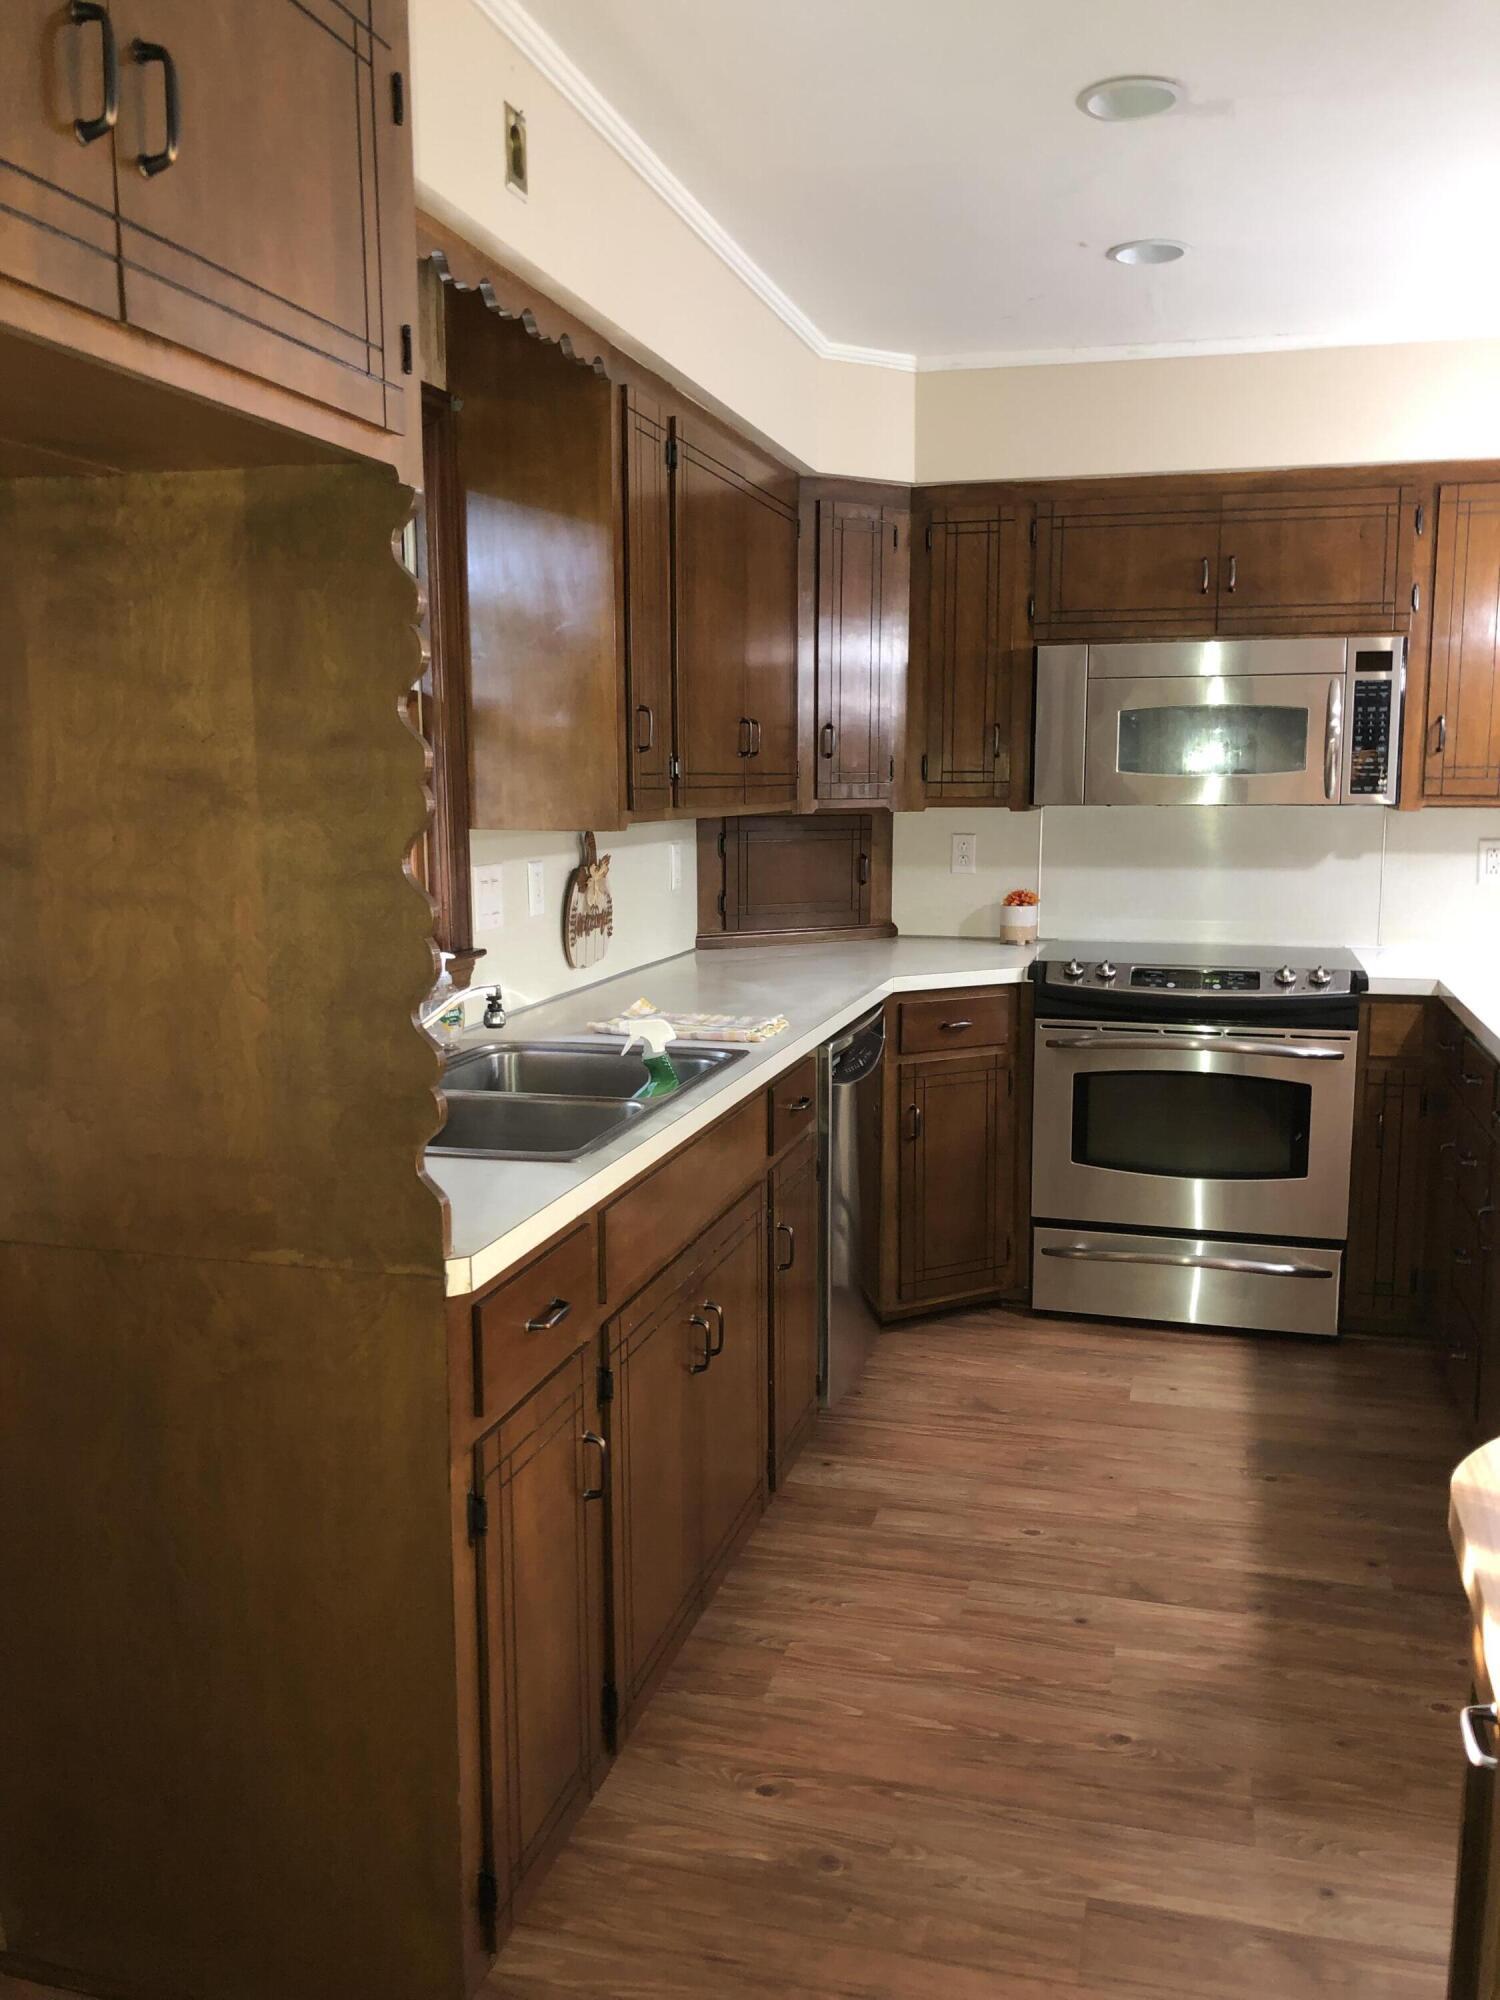 Cooper Estates Homes For Sale - 679 Pawley, Mount Pleasant, SC - 21